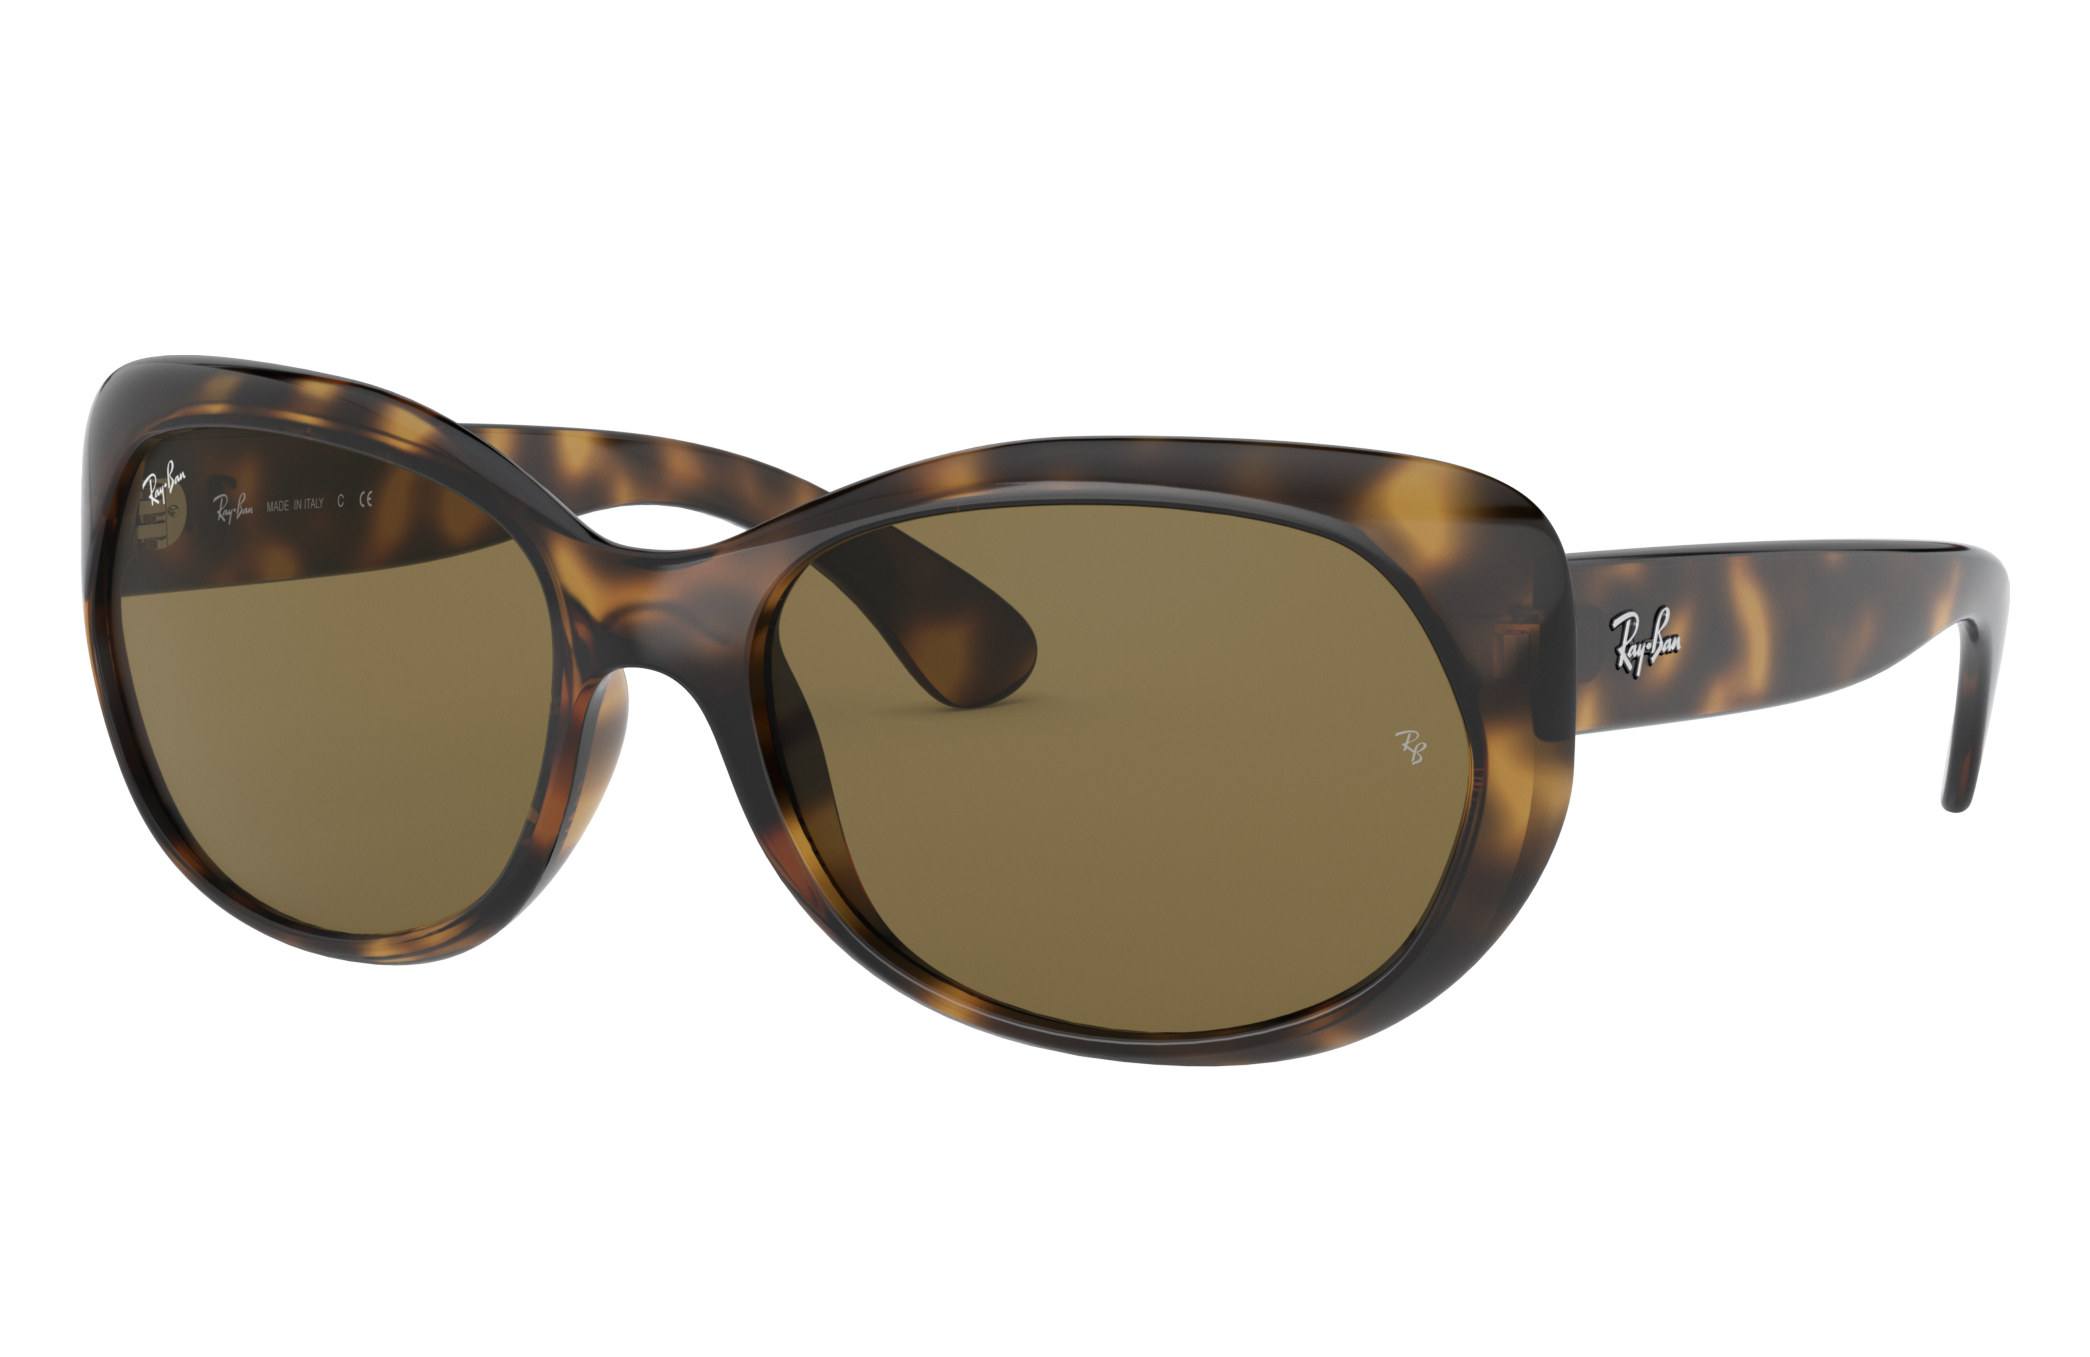 Ray-Ban Rb4325 Tortoise, Brown Lenses - RB4325